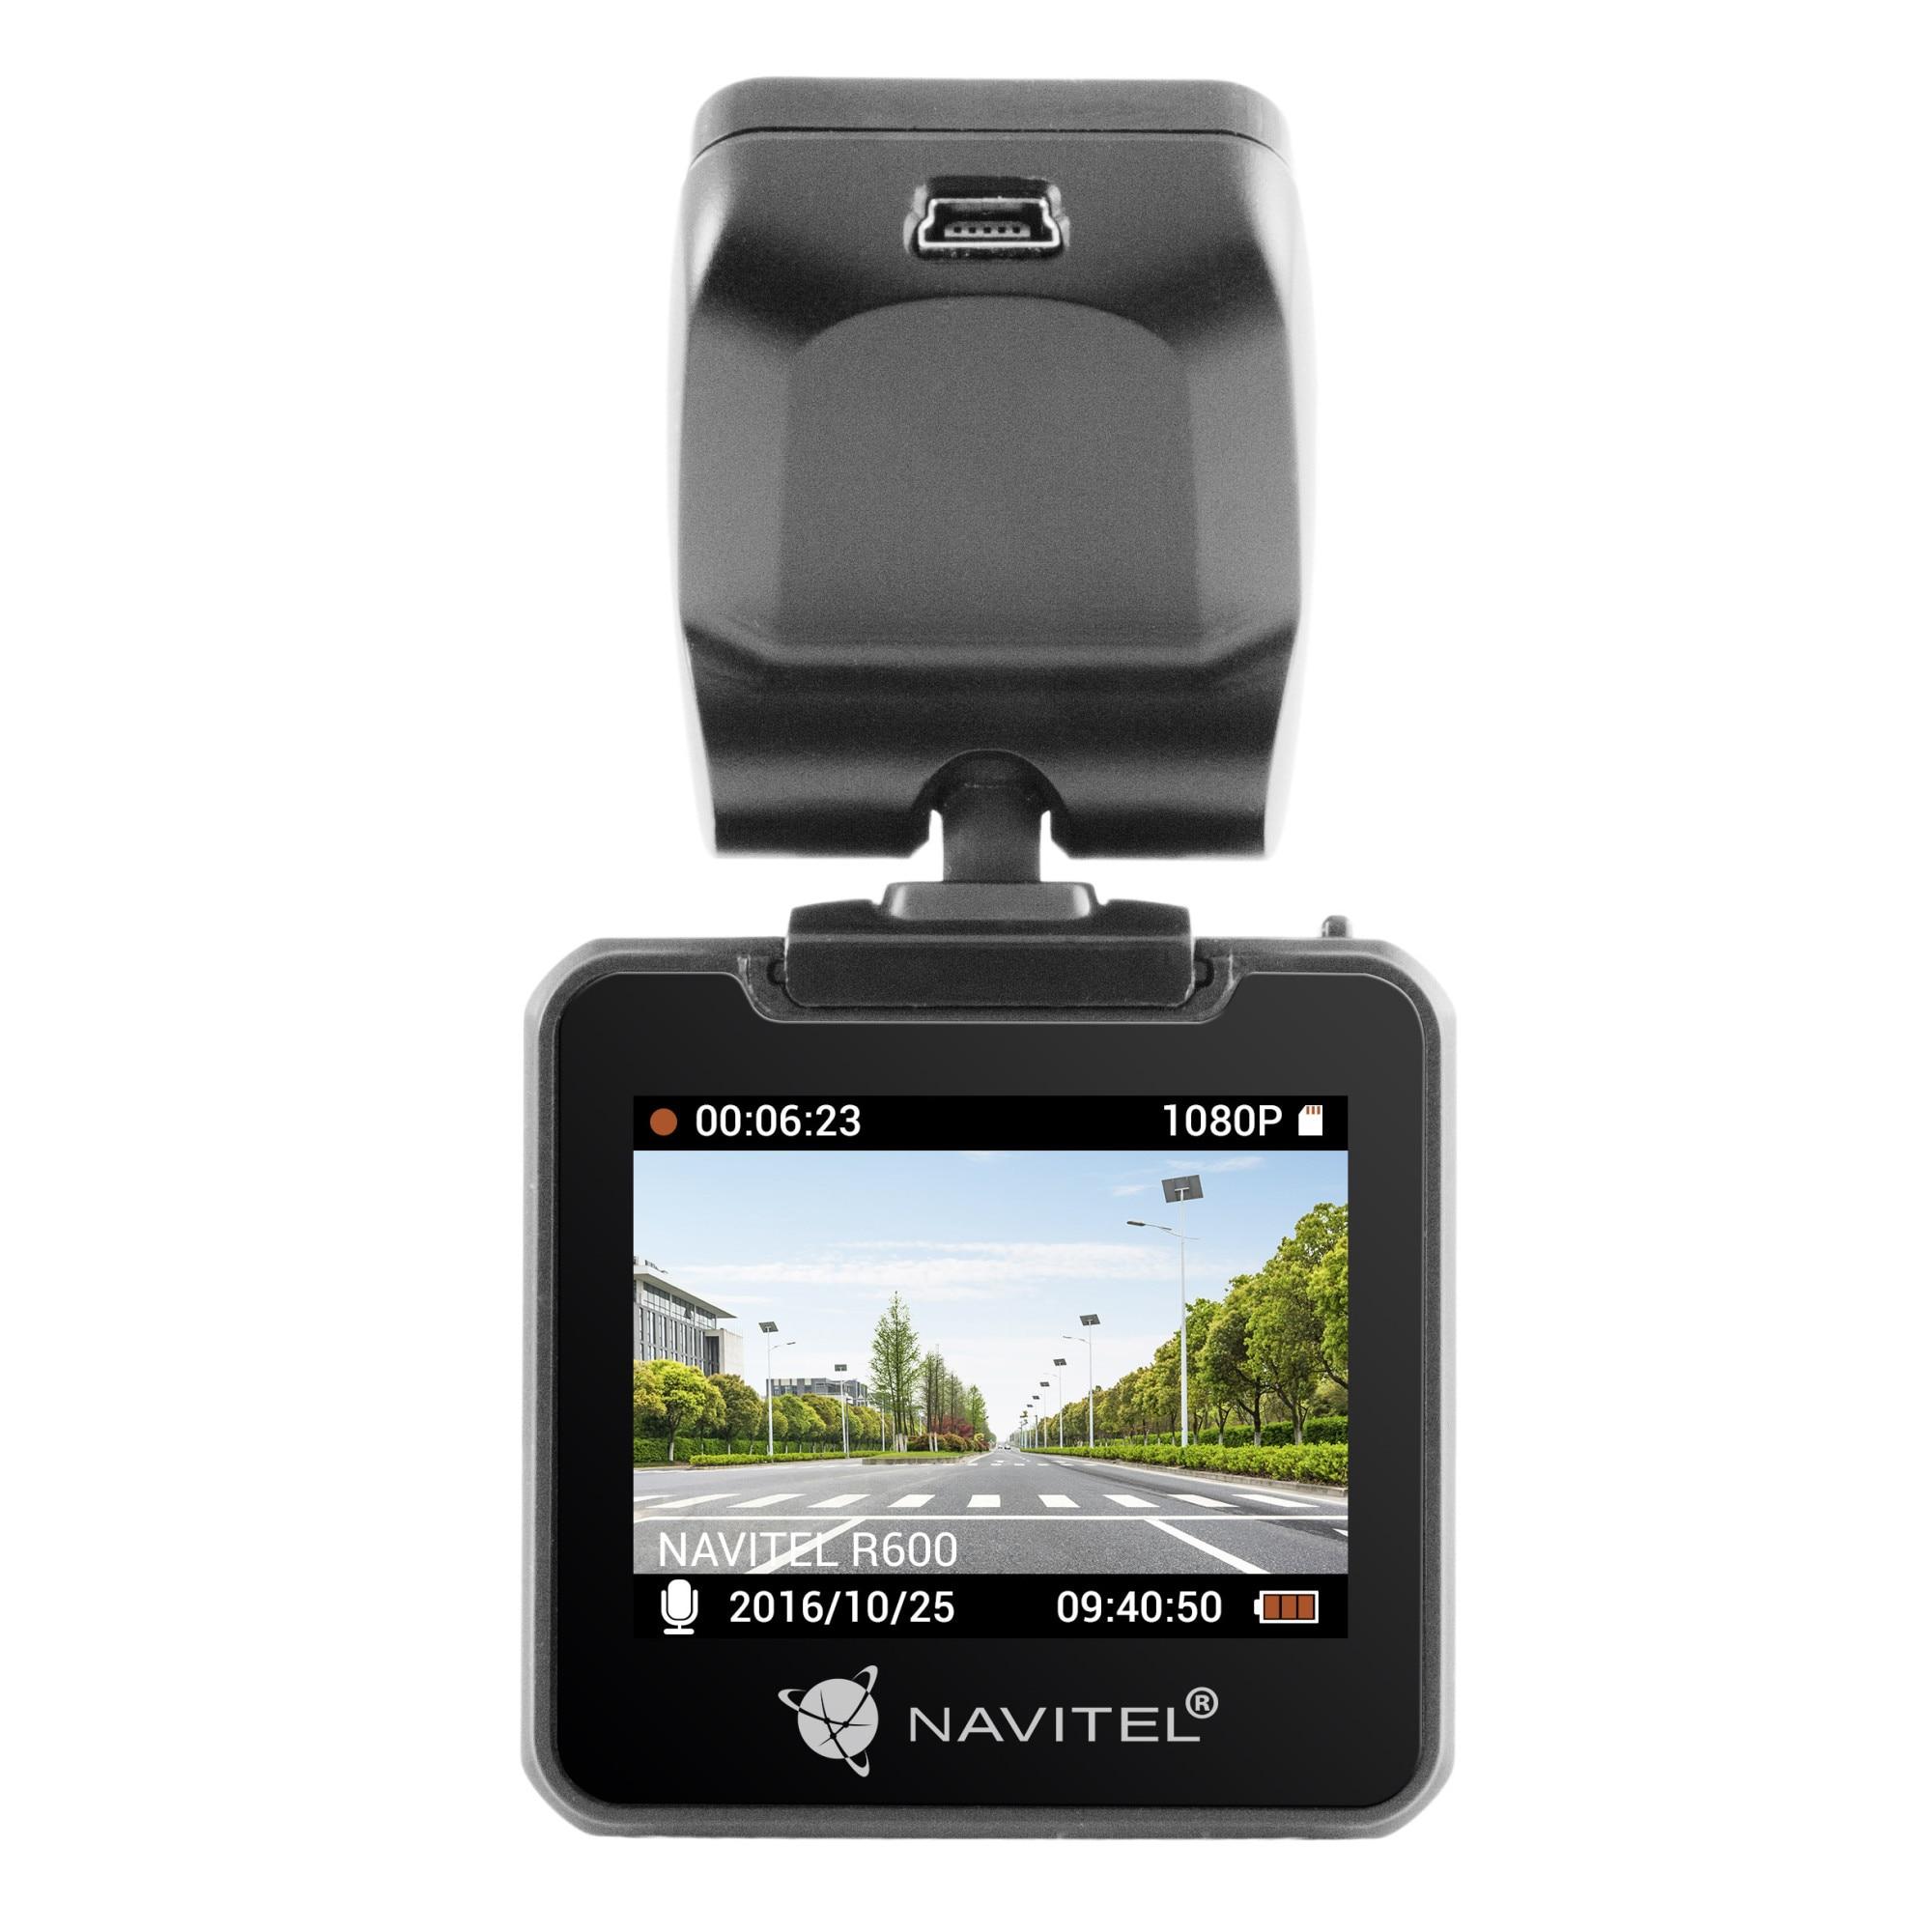 "Fotografie Camera Auto DVR Navitel R600, ecran 2.0"" inregistrare FHD/30fps, vizibilitate 170°, G-Sensor, Senzor Sony 323 de 12 Megapixeli"